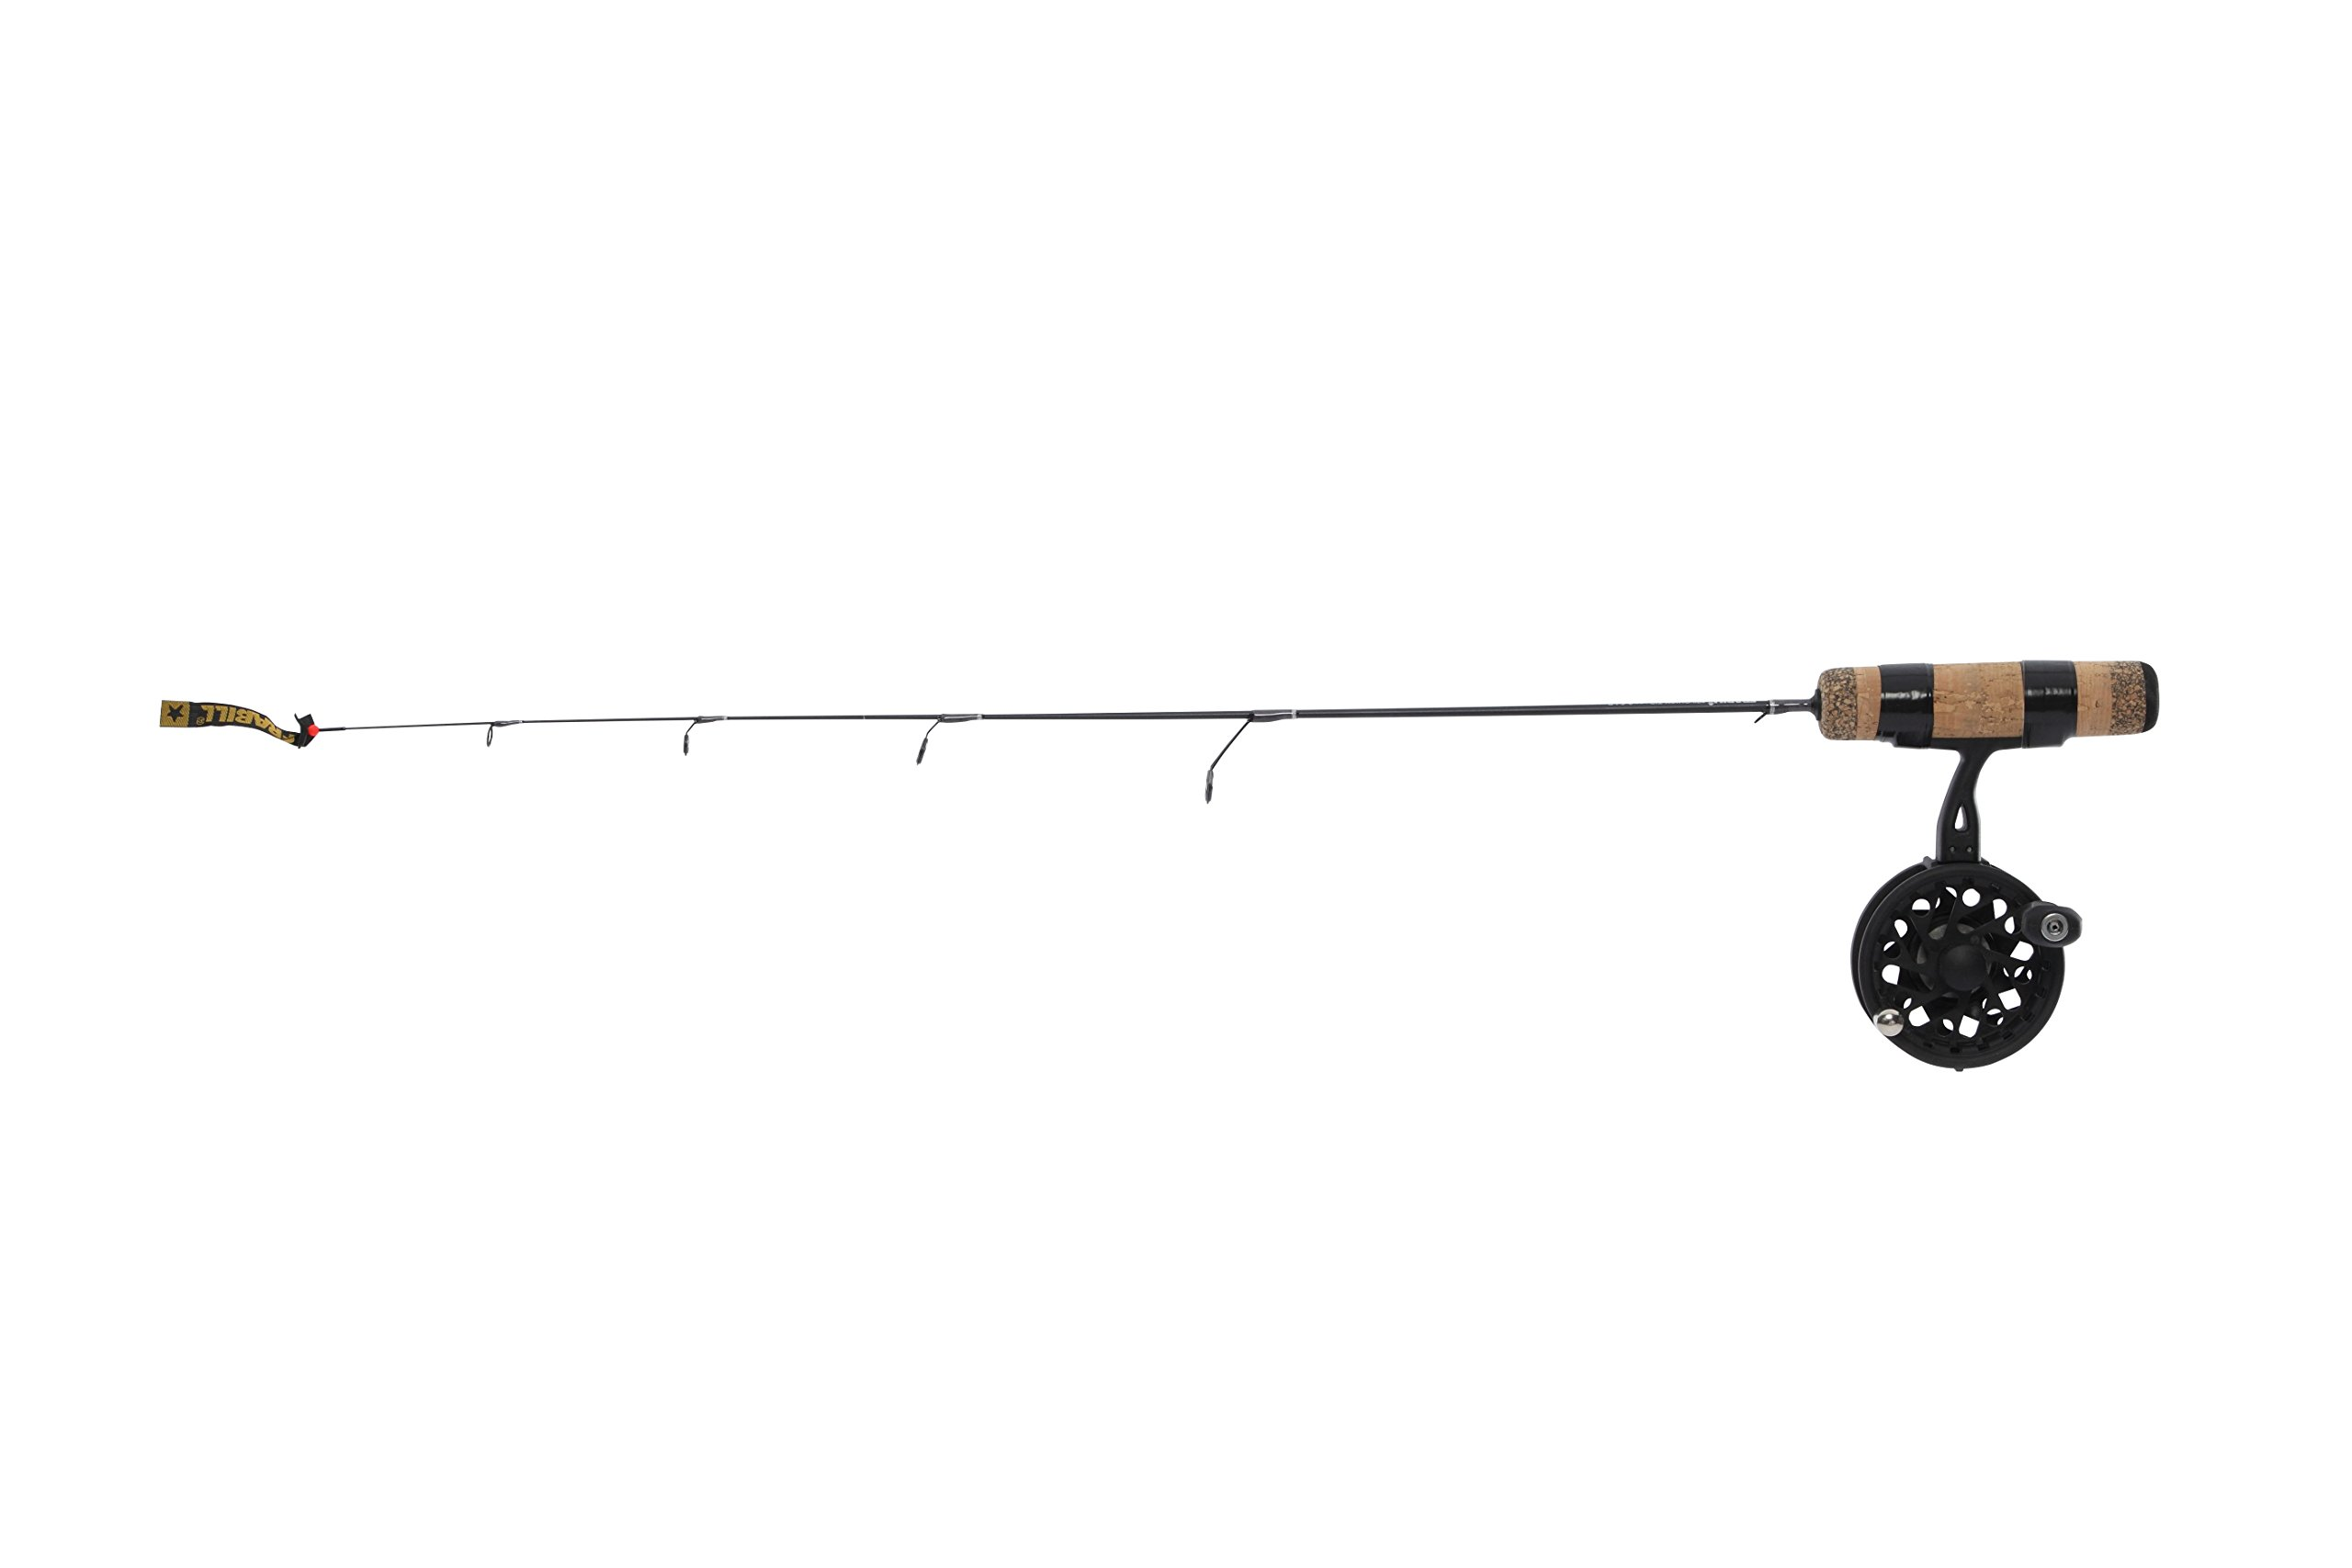 Frabill Straight Line 101XLA 32-Inch Quick Tip Ice Fishing Combo, Black